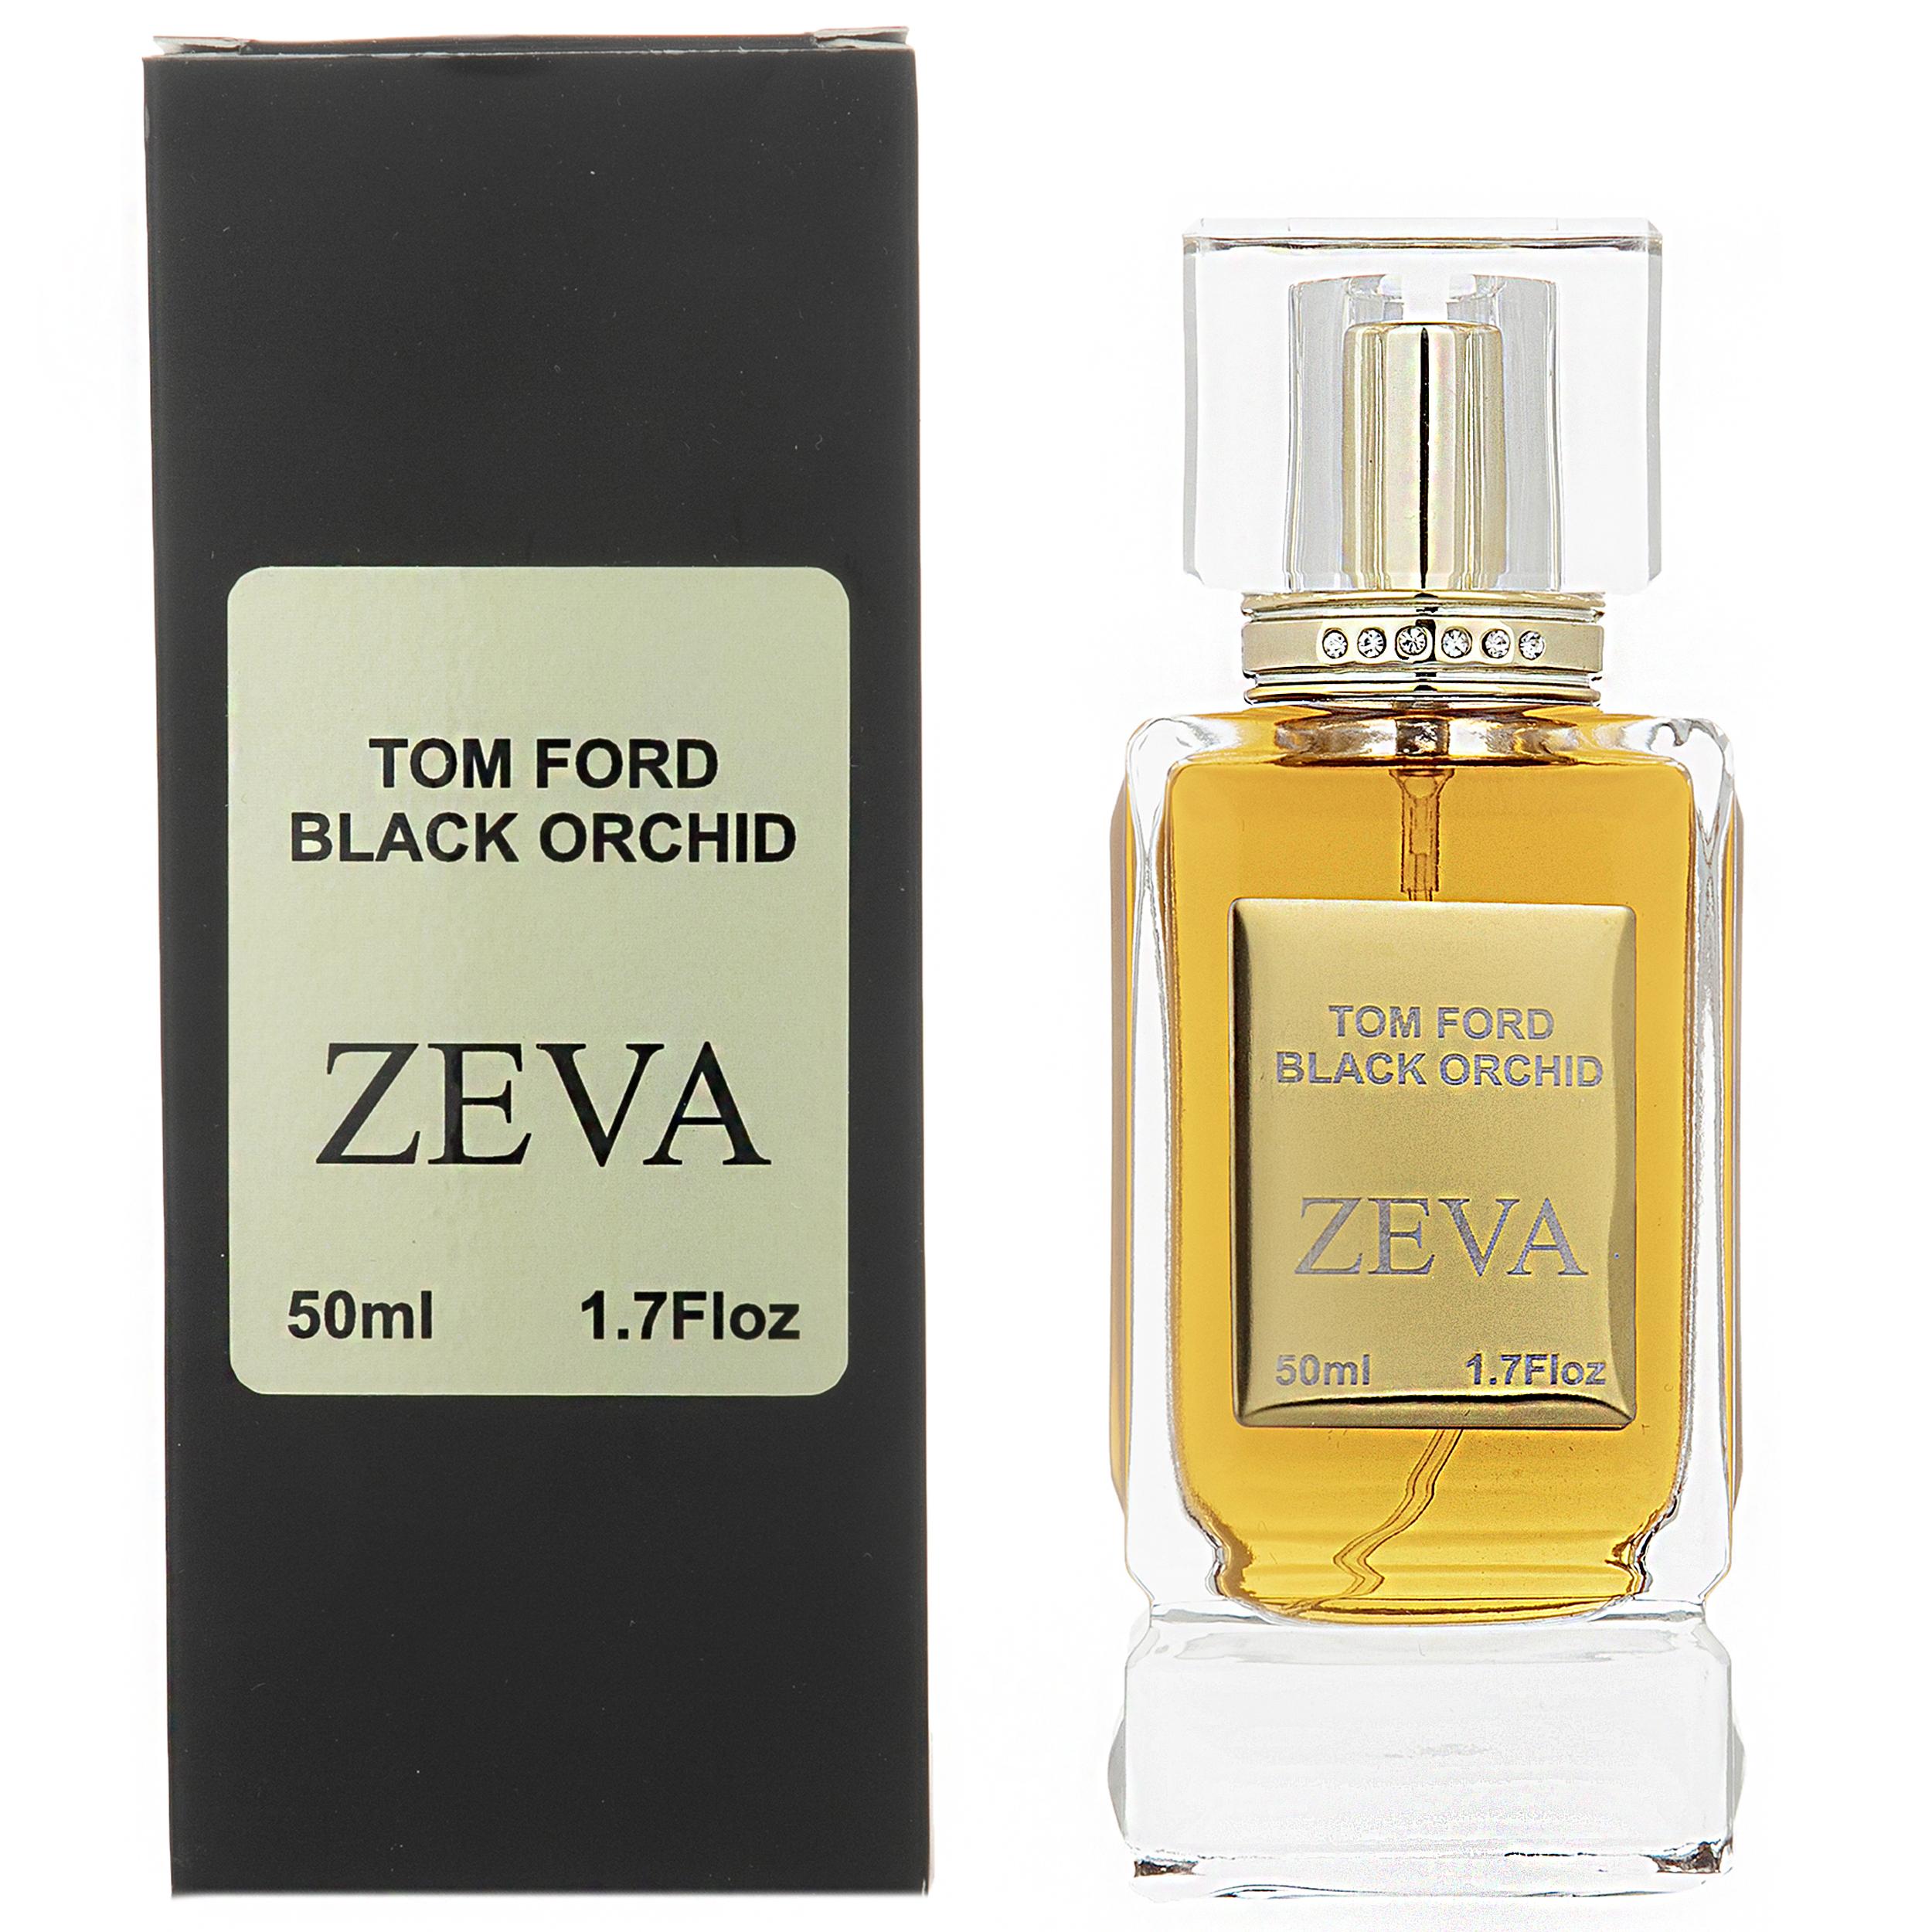 ادو پرفیوم زنانه زوا مدل Tom Ford Black Orchid حجم 50 میلی لیتر